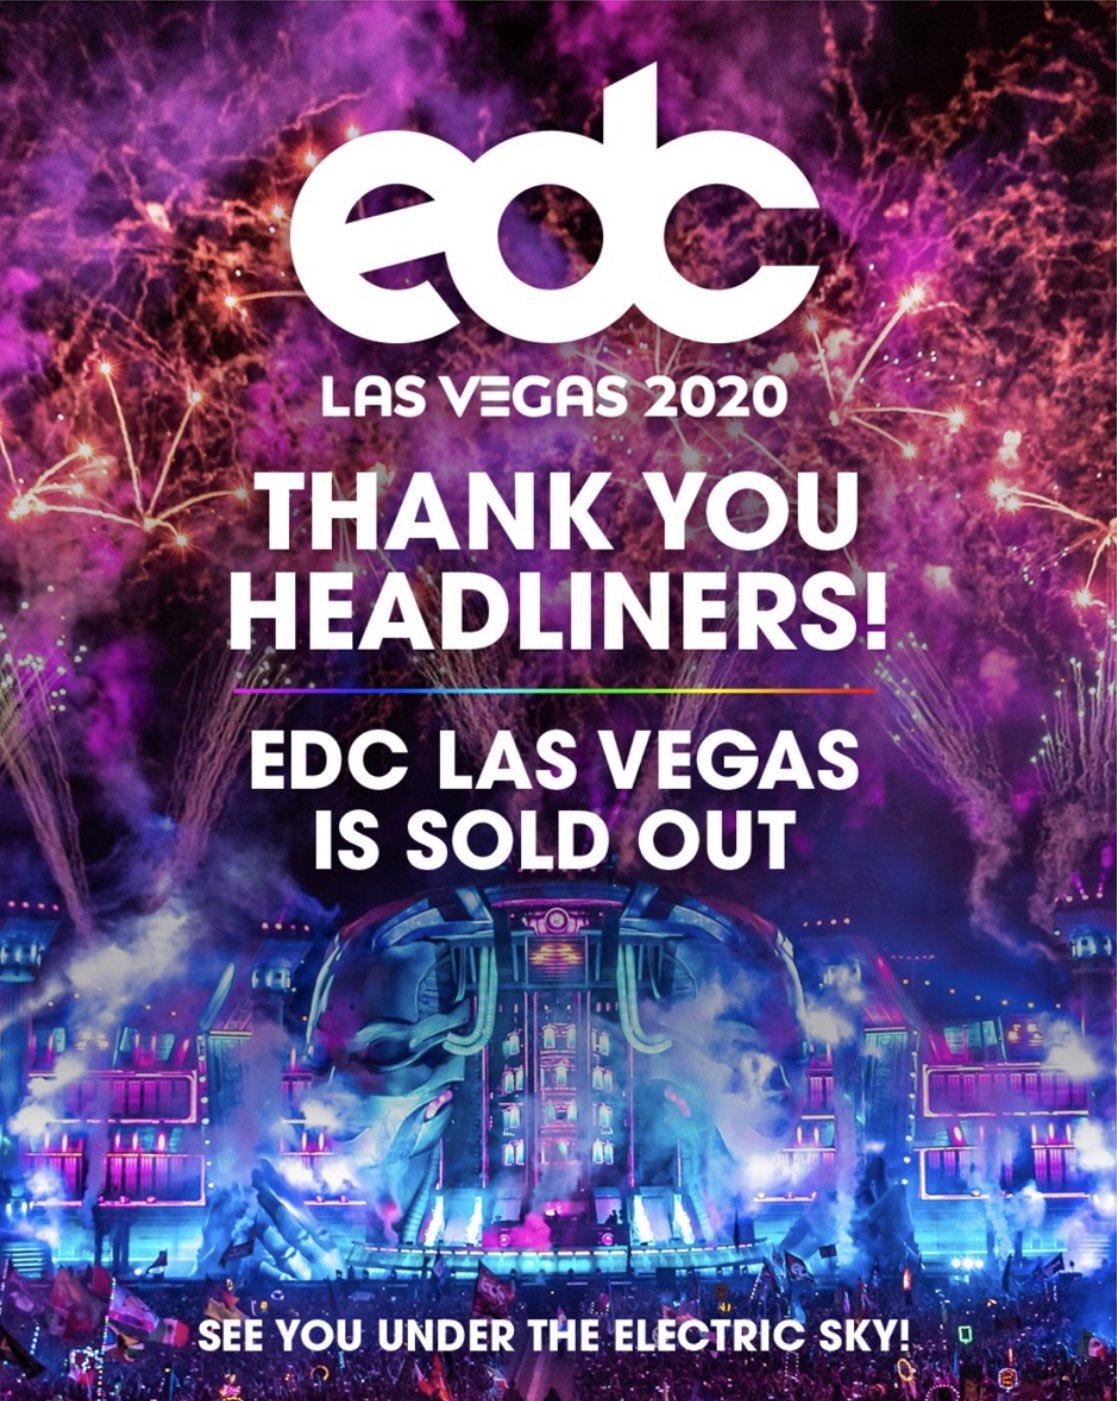 EDC Las Vegas 2020 Sold Out